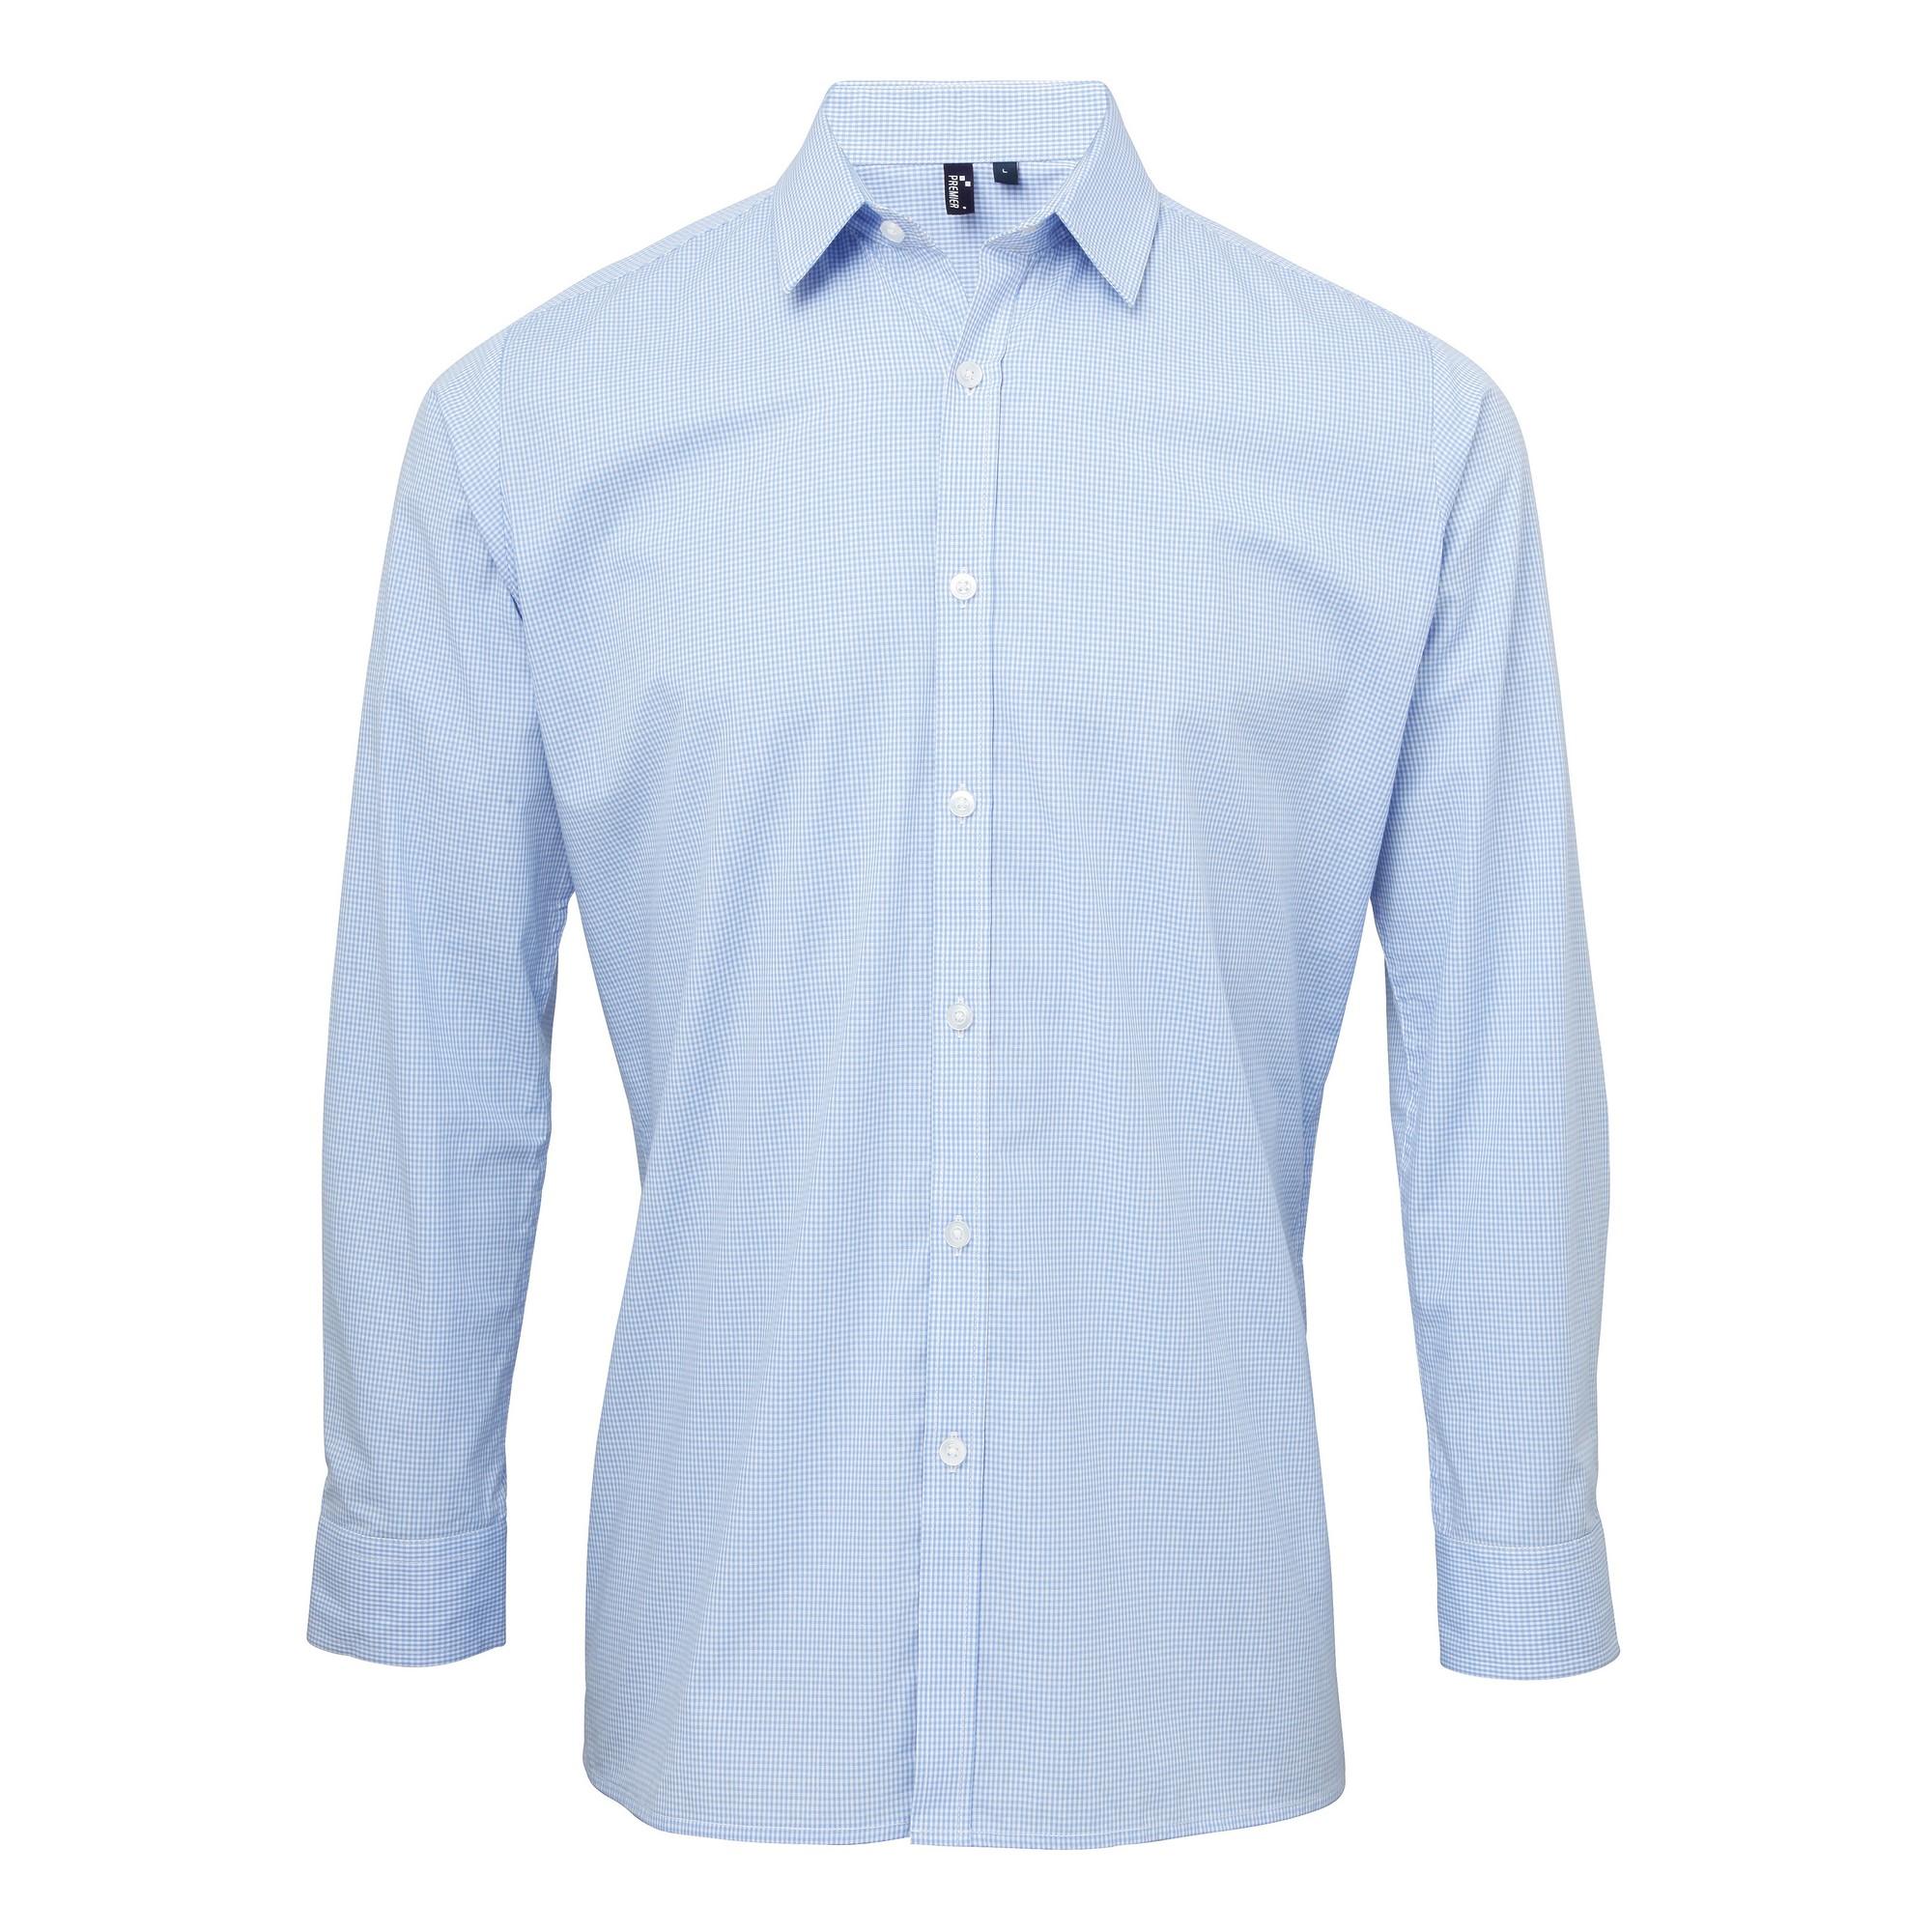 Premier Mens Microcheck Long Sleeve Shirt (XL) (Light Blue/White)